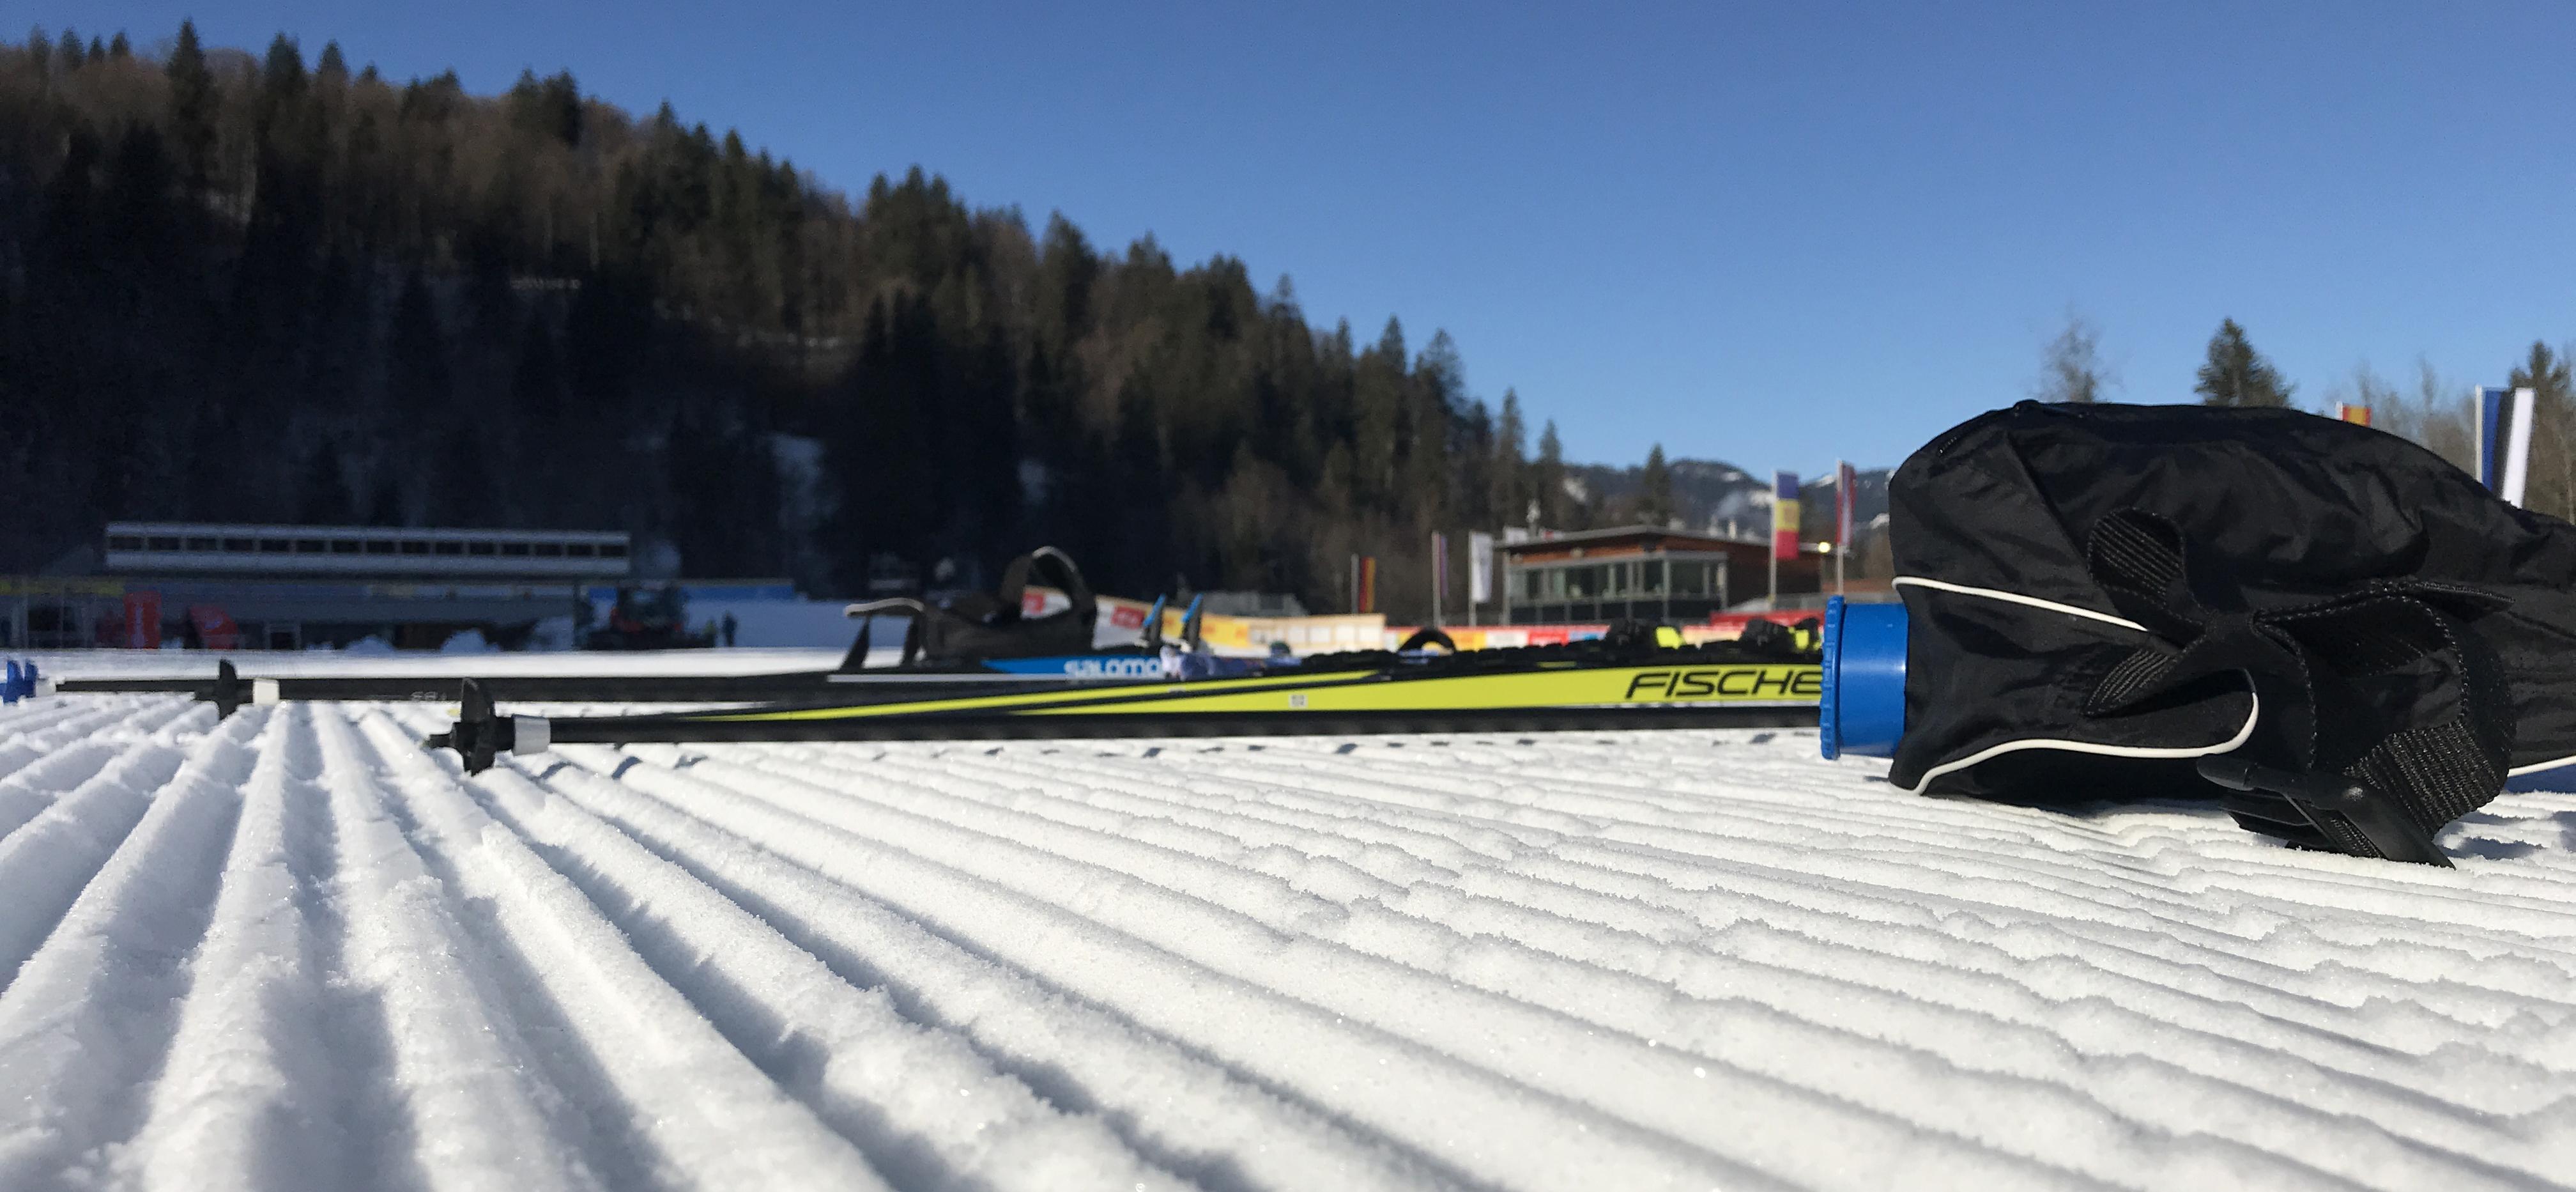 Yellow Universal Ski Wax 80 Gram bar Low Fluorocarbon Made in America Fast Wax